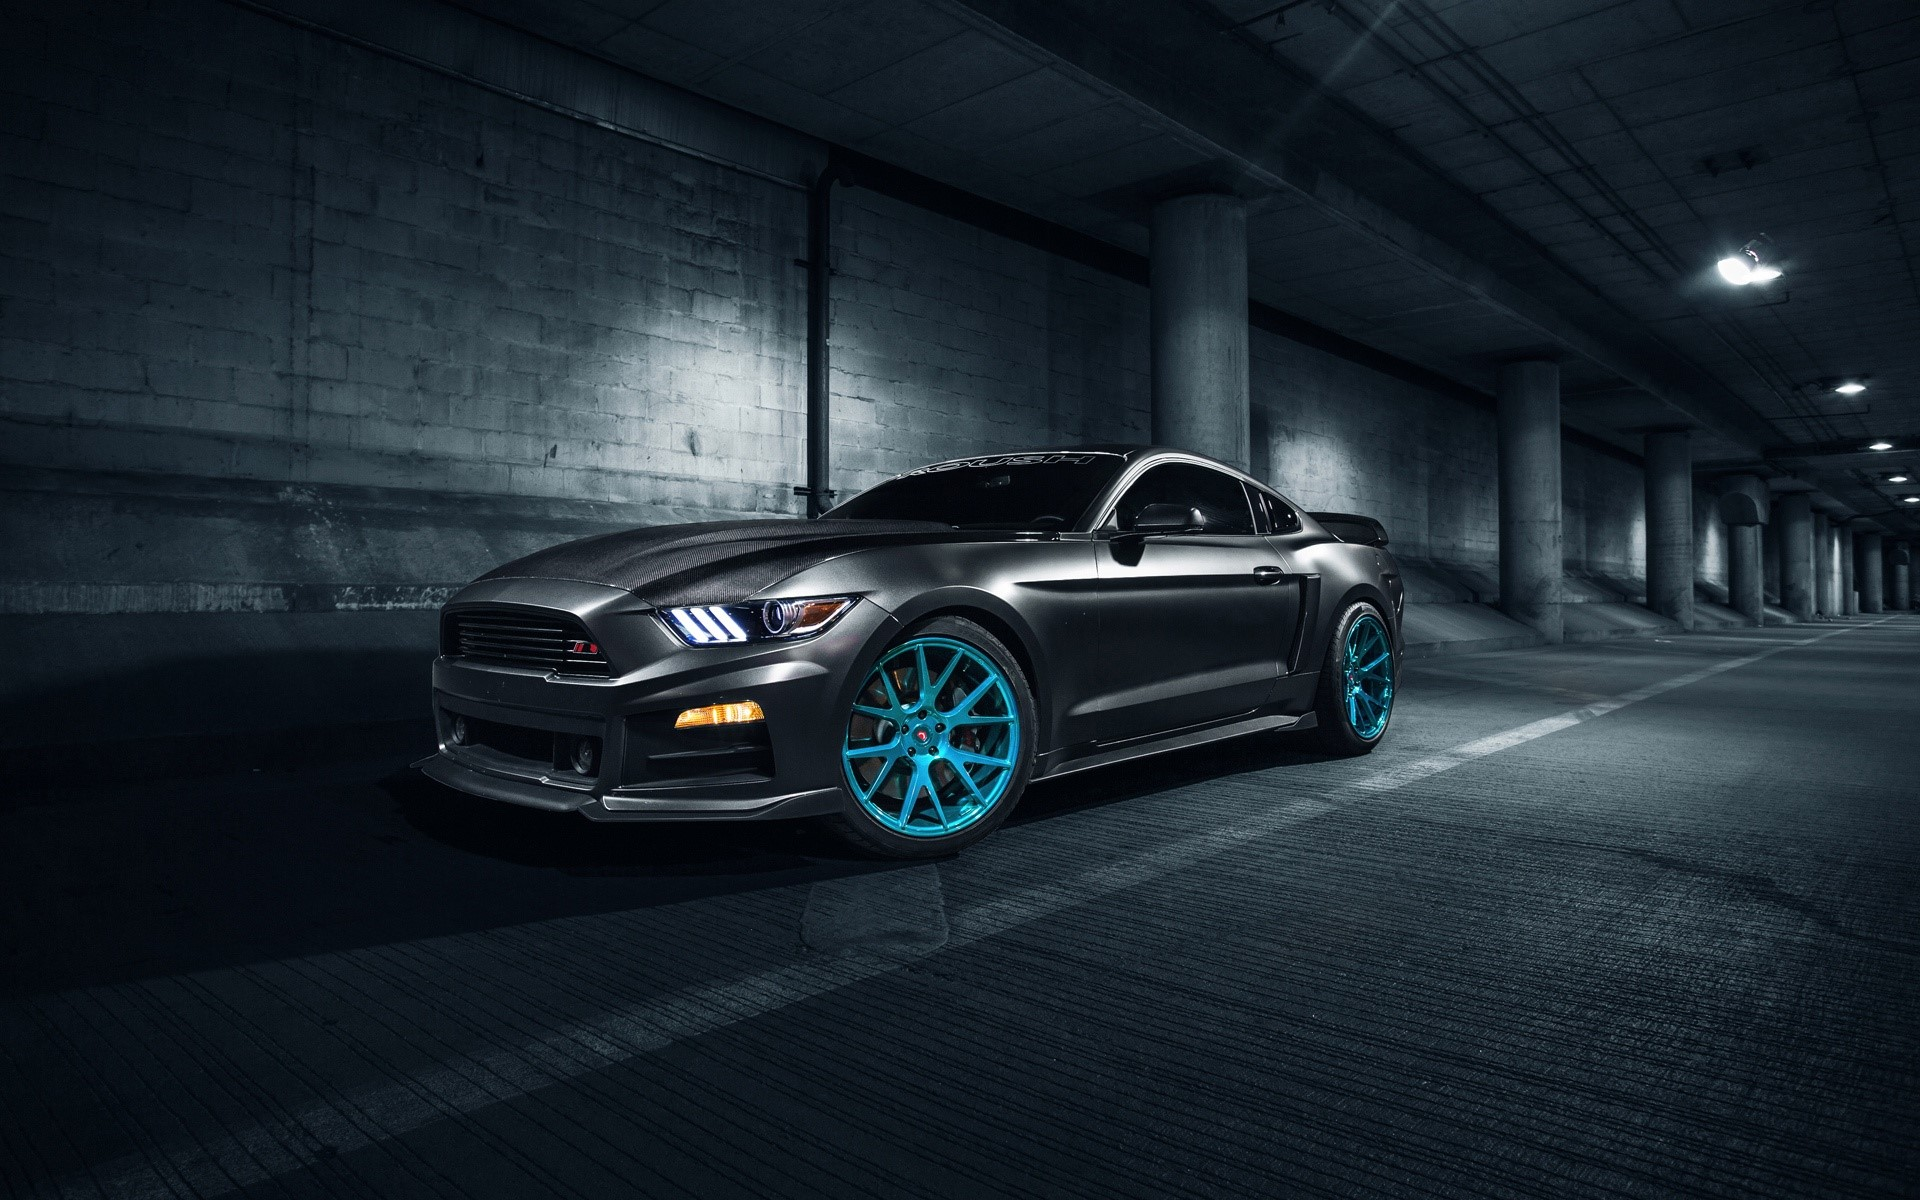 Wallpaper Roush Performance Mustang Vossen Wheels Images